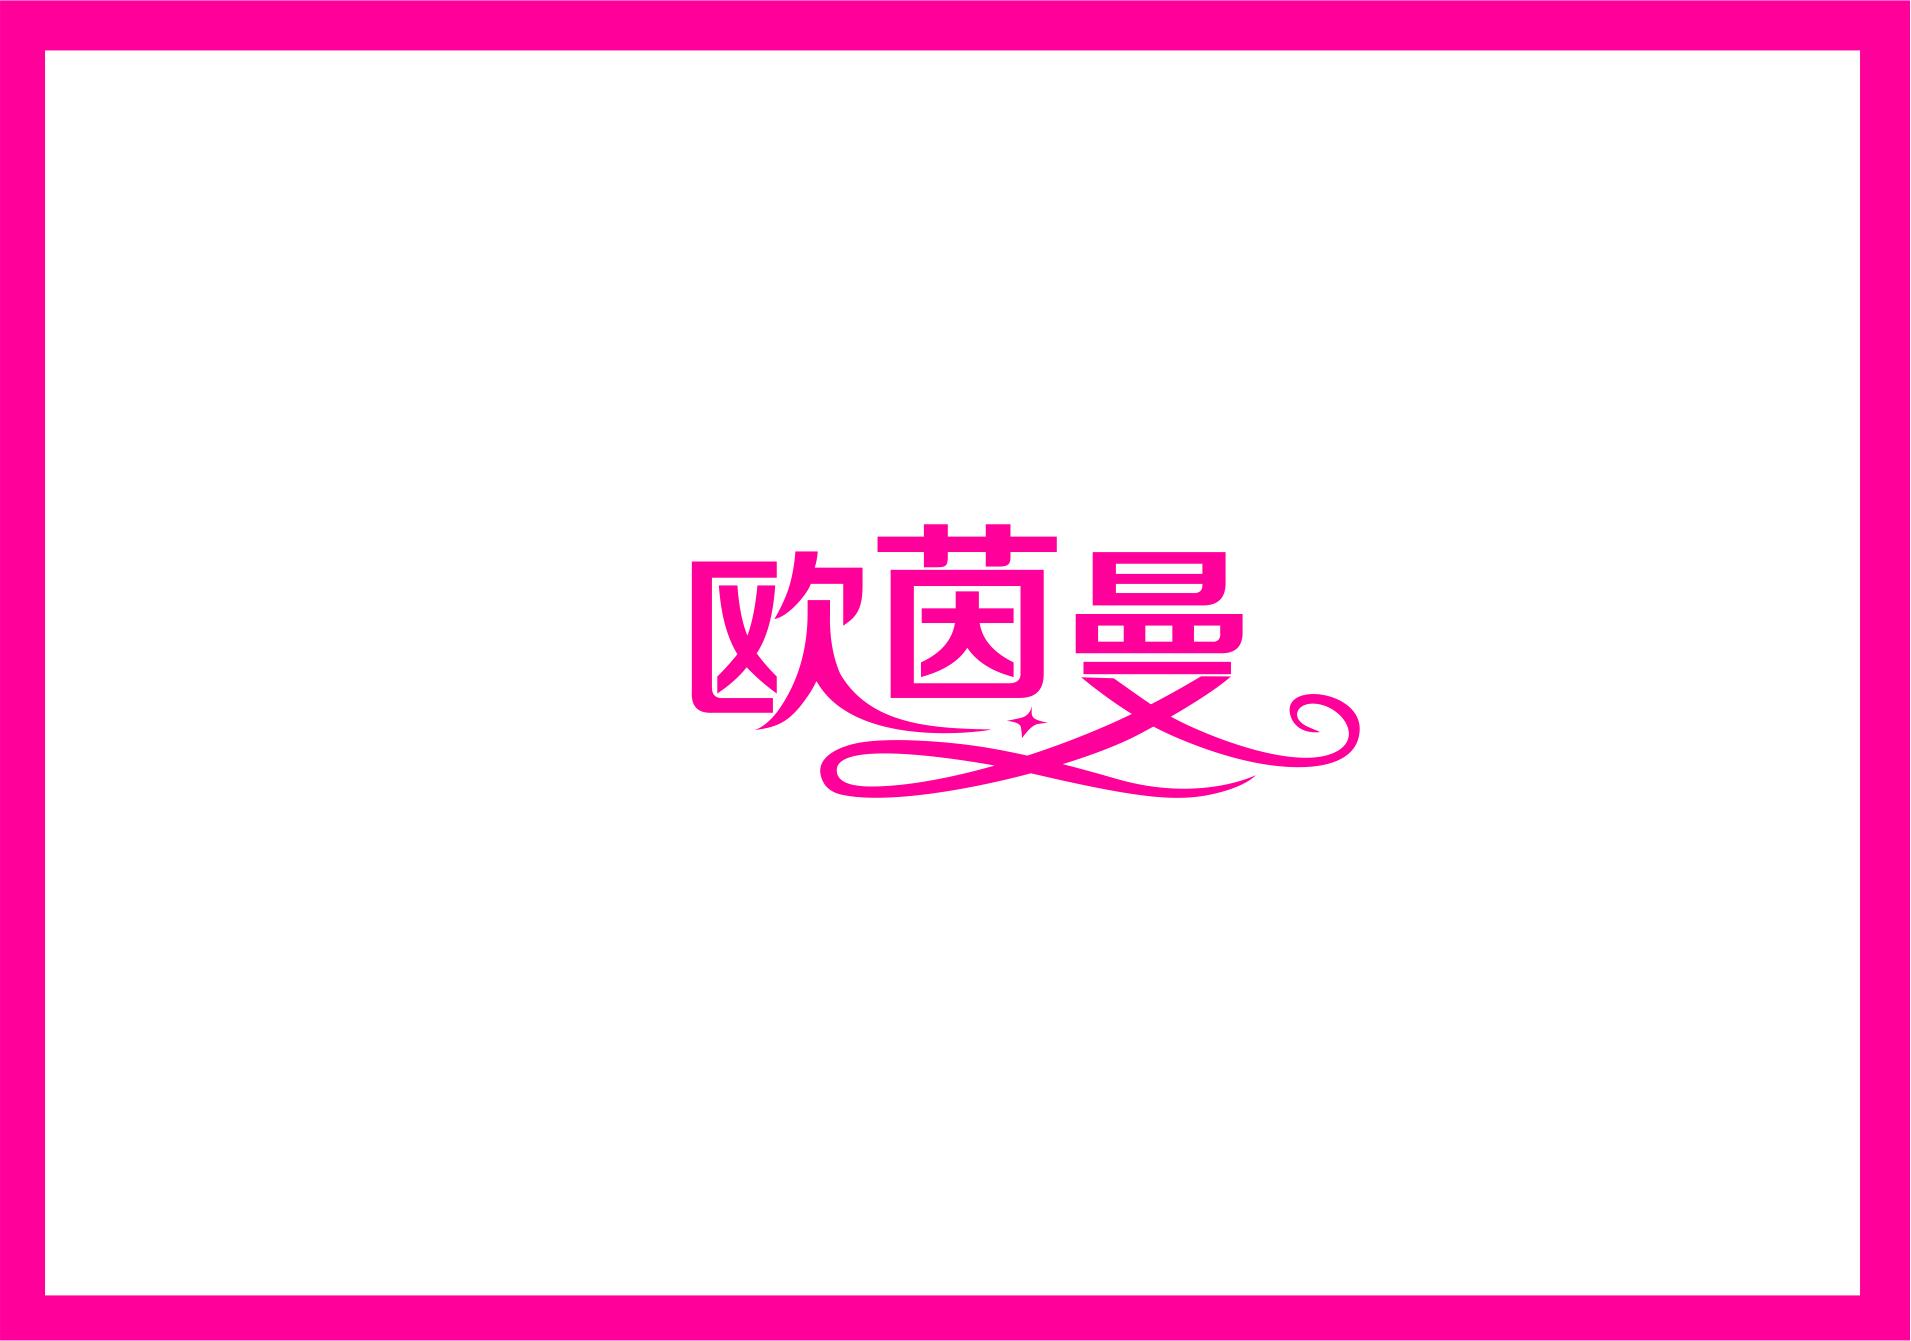 ppt 背景 背景图片 边框 模板 设计 矢量 矢量图 素材 相框 1911_1341